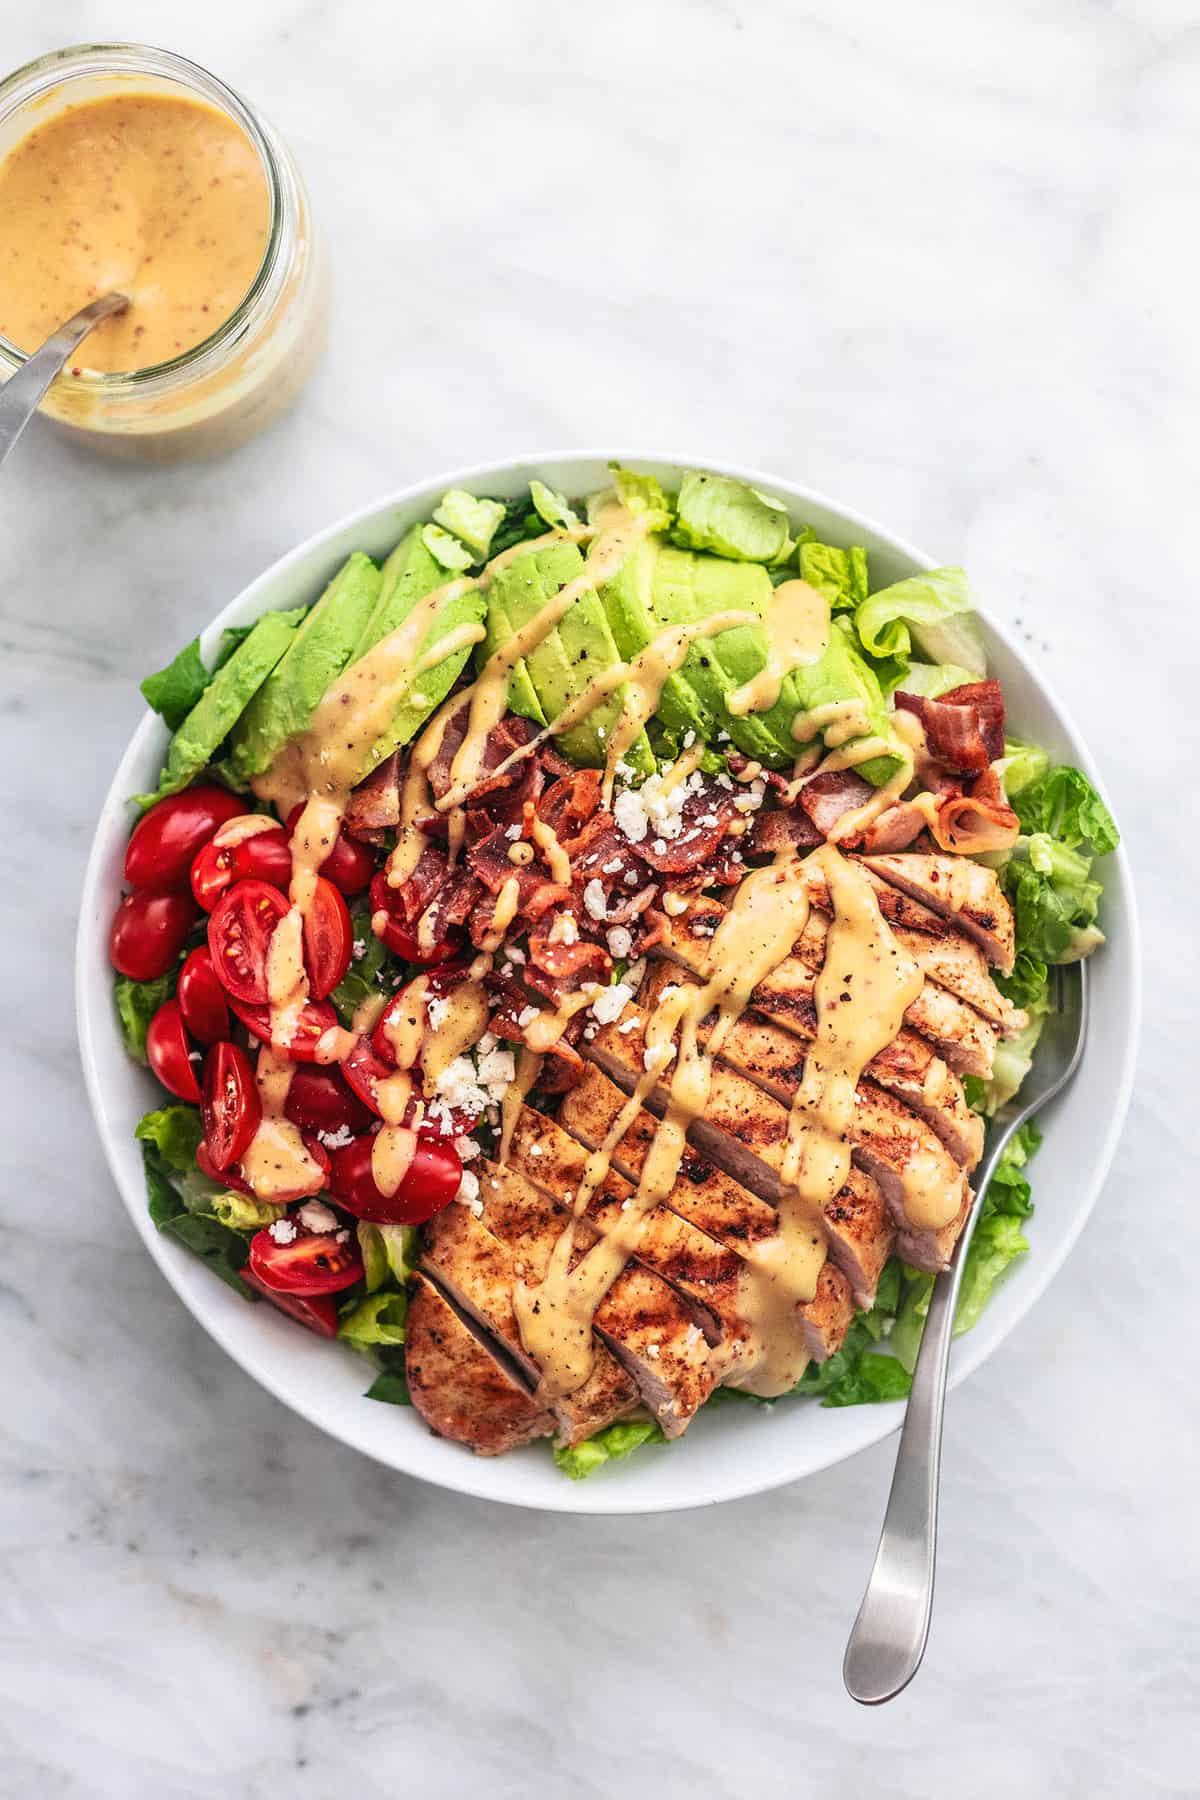 Einfaches gesundes und leckeres Hühnchen-Avocado-Salat-Rezept | lecremedelacrumb.com